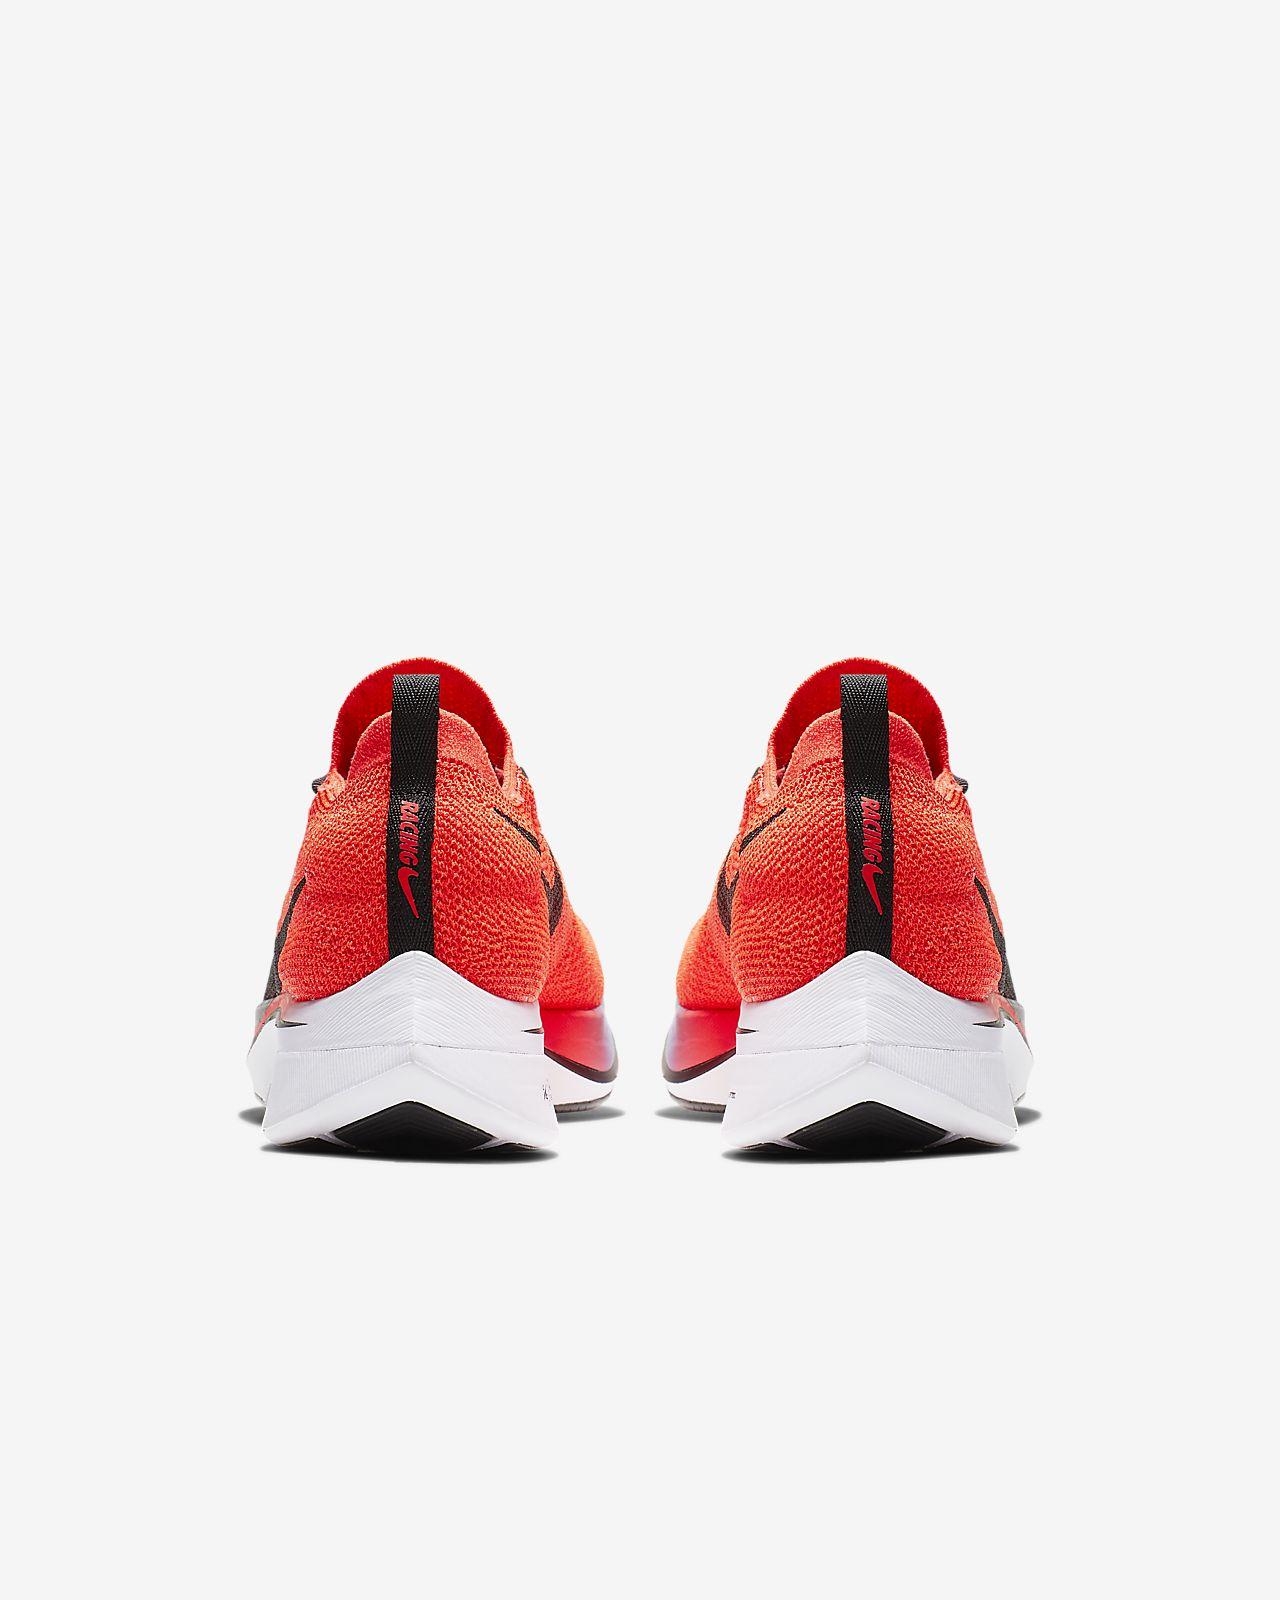 475b8bf03f3d Nike Vaporfly 4% Flyknit Running Shoe. Nike.com GB